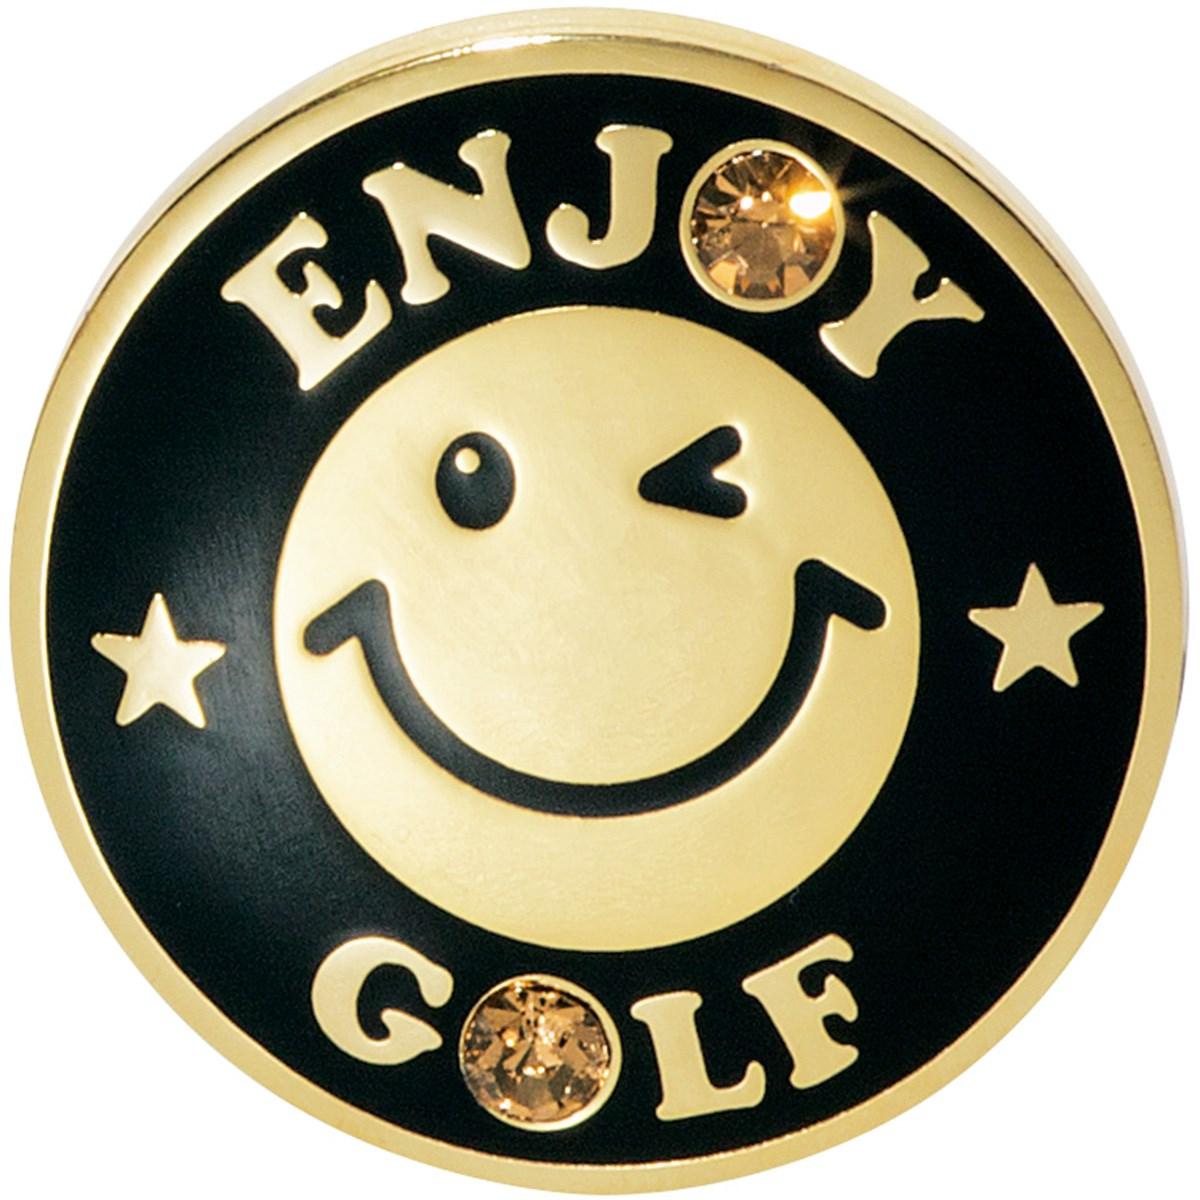 WINWIN STYLE ENJOY GOLF Gold Ver. マーカー